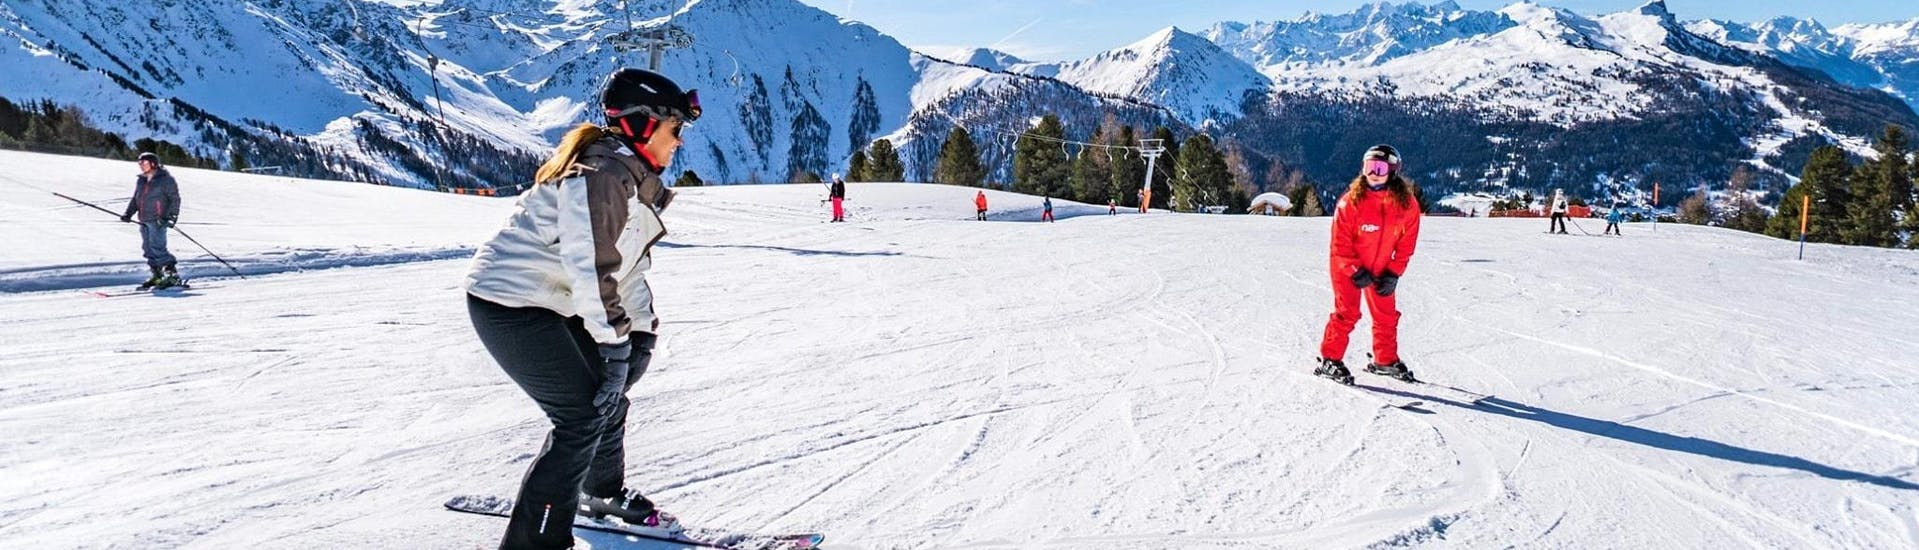 private-ski-lessons-for-families-neige-aventure-hero